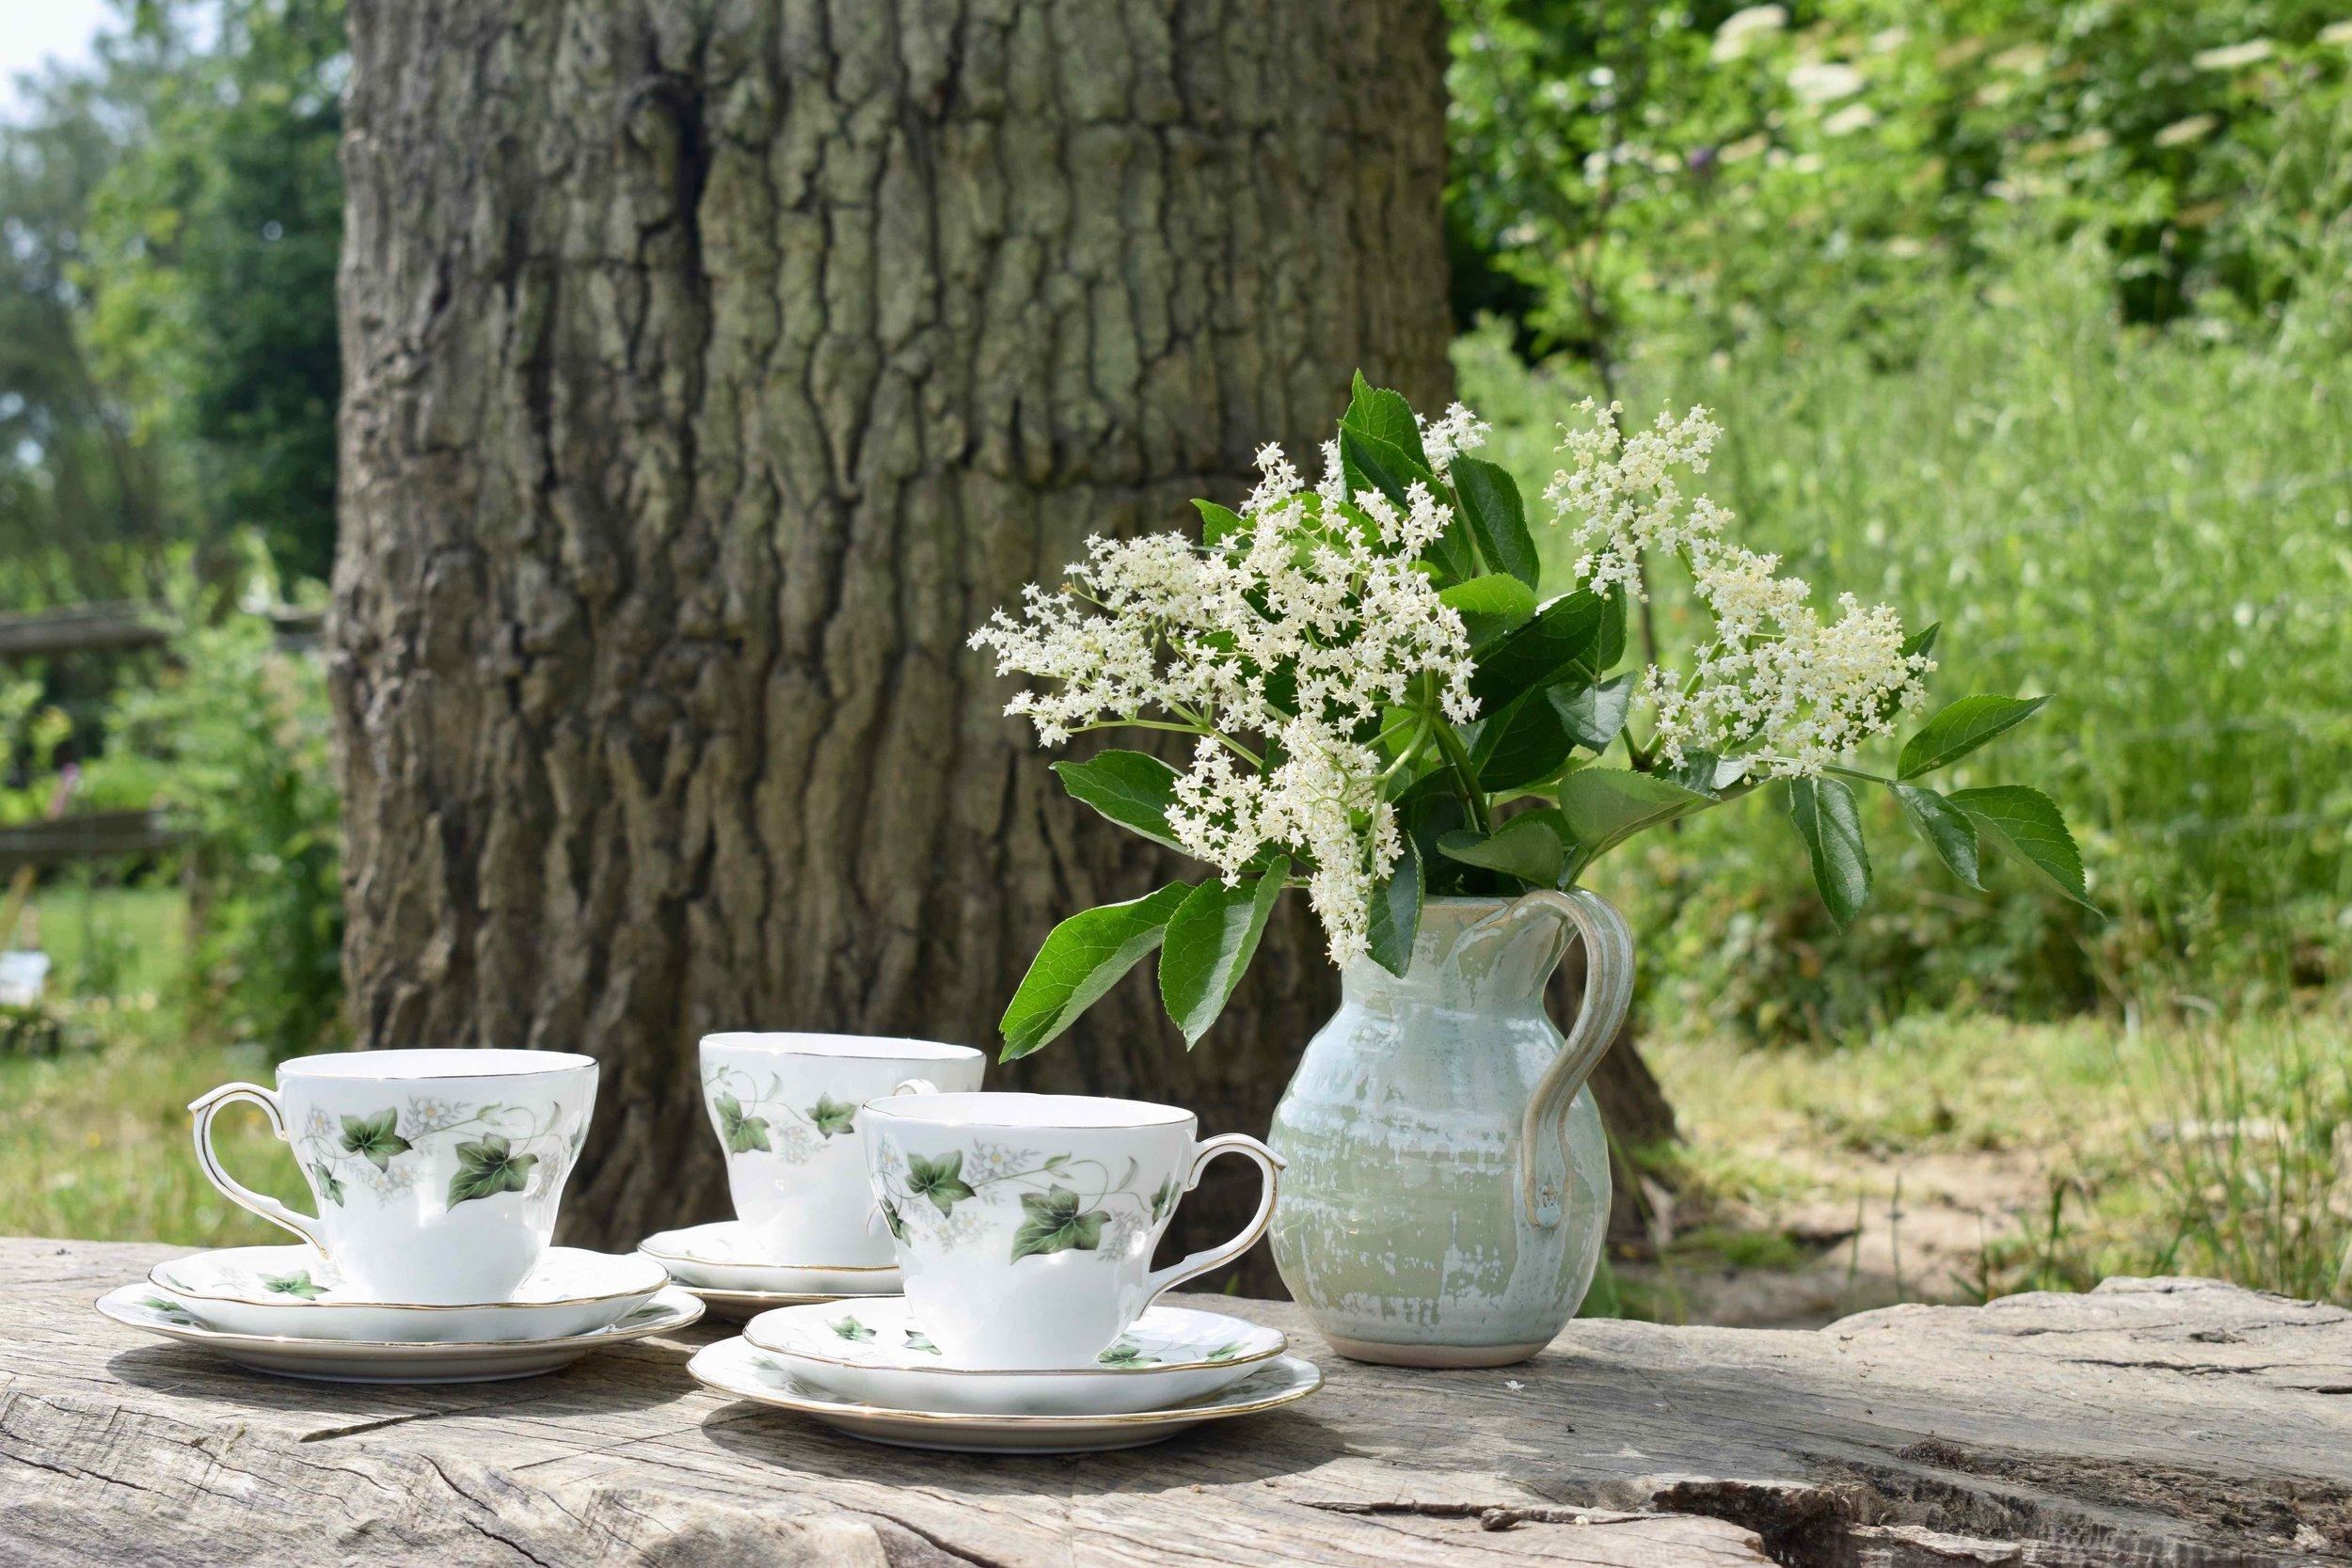 Ivy Teacups